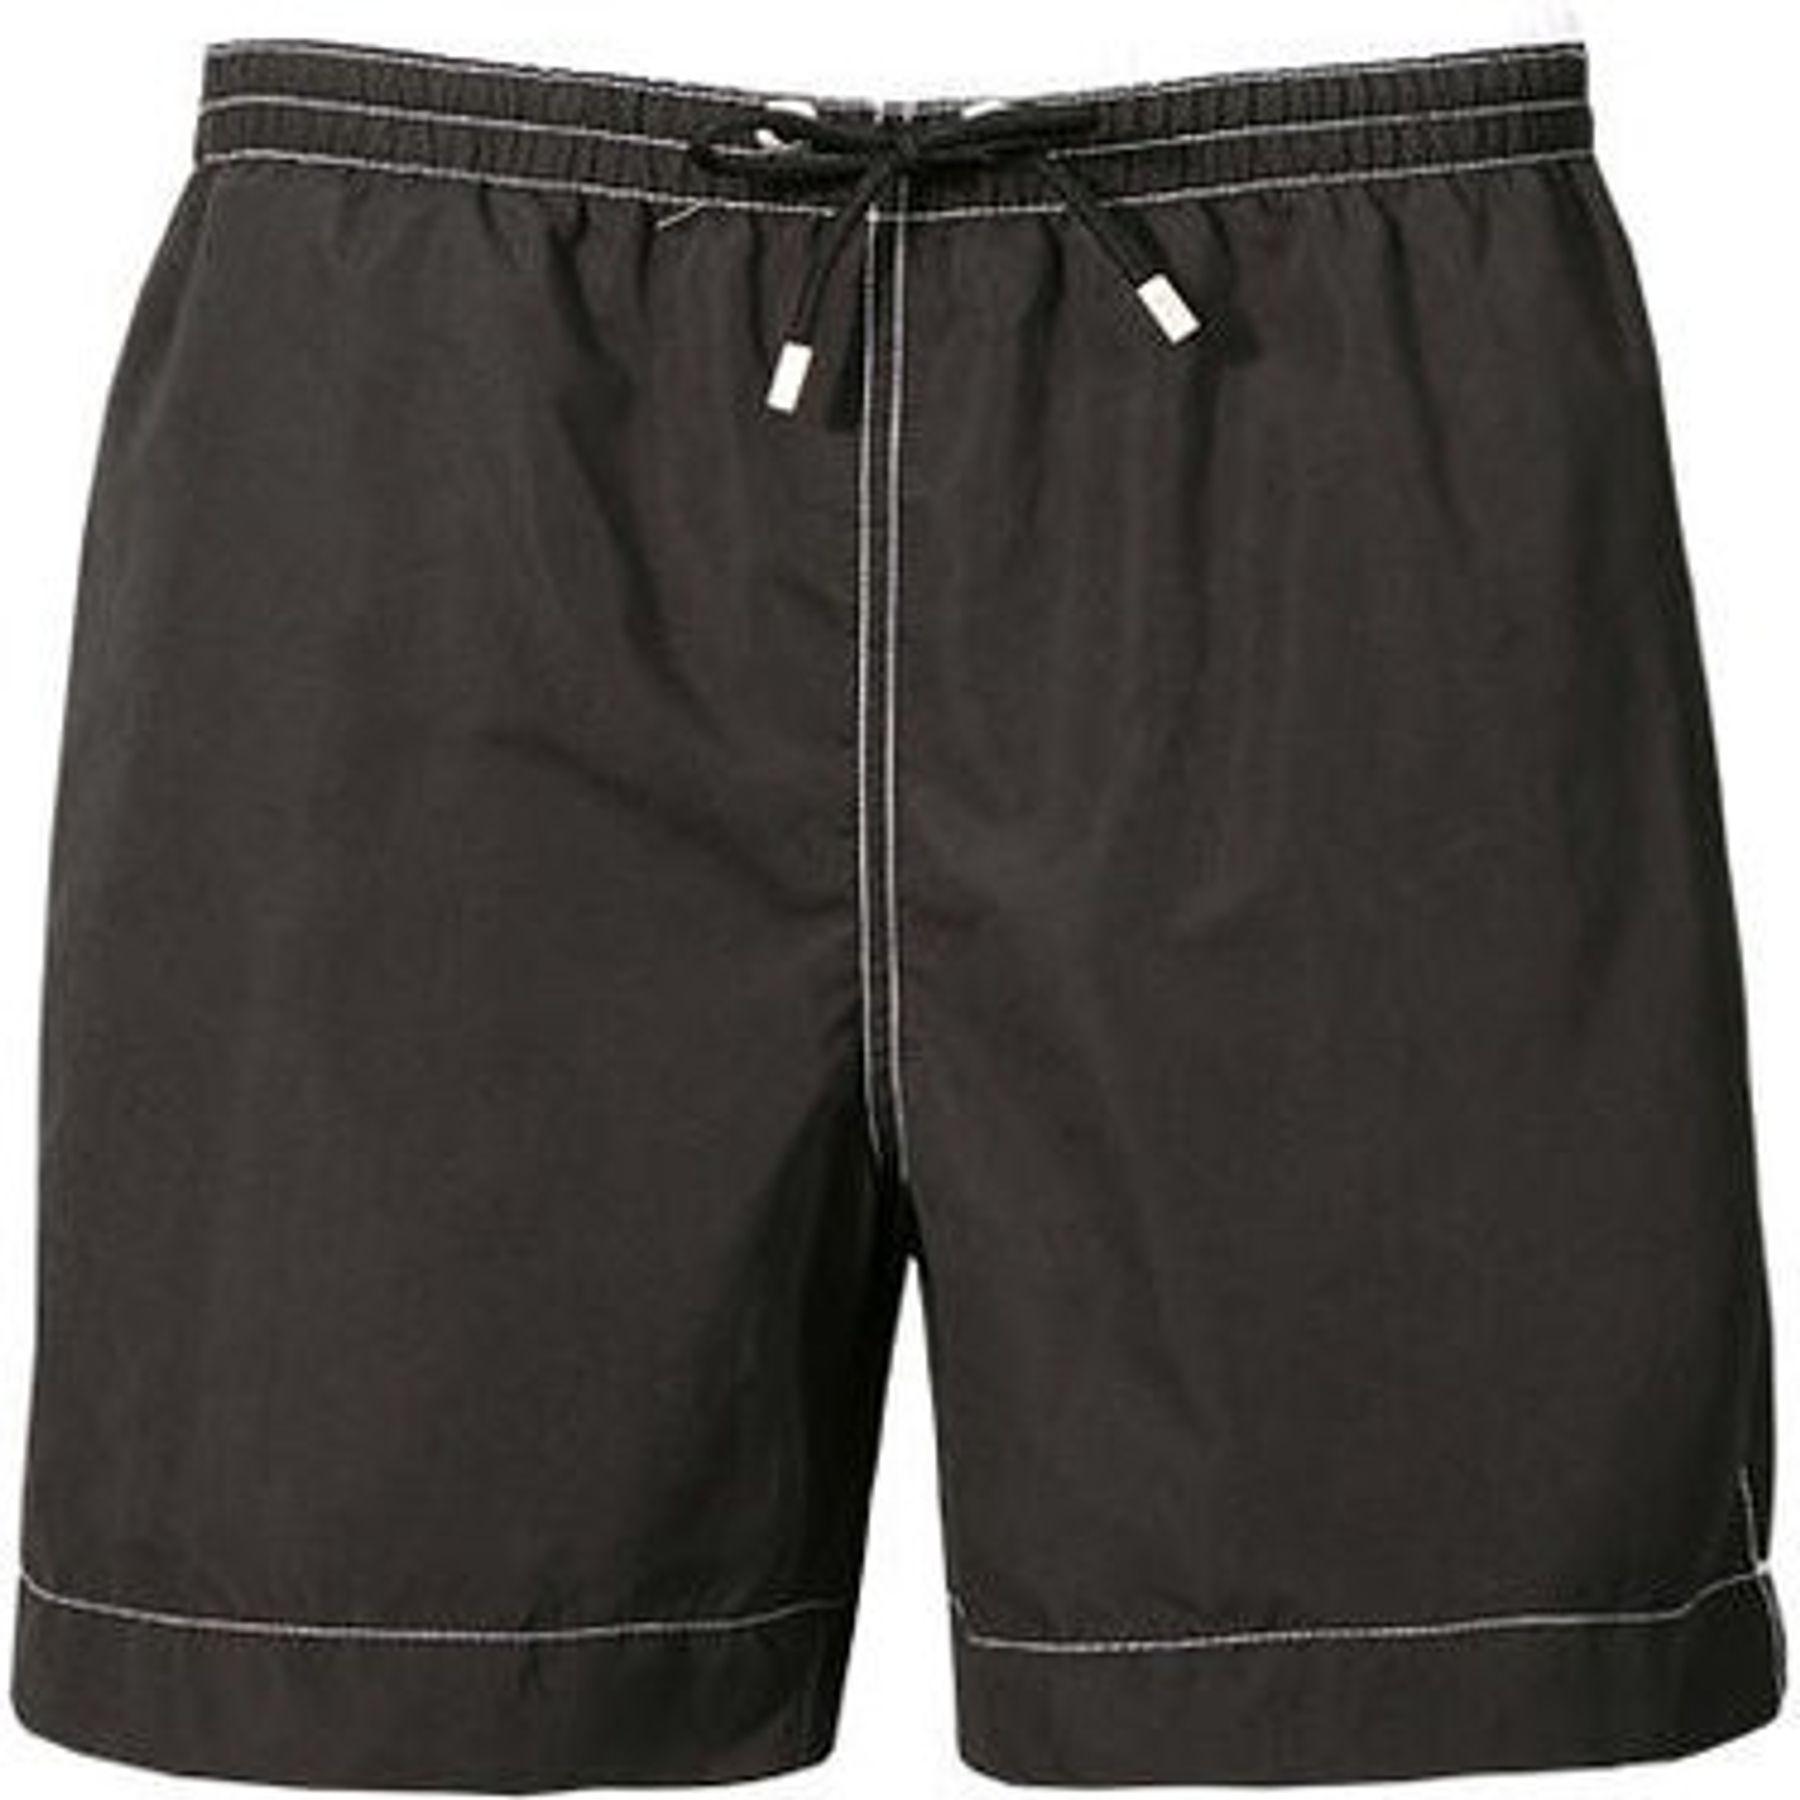 Jockey - Herren Long-Short USA Originals, Beachwear (60013) in 3 Farben – Bild 5